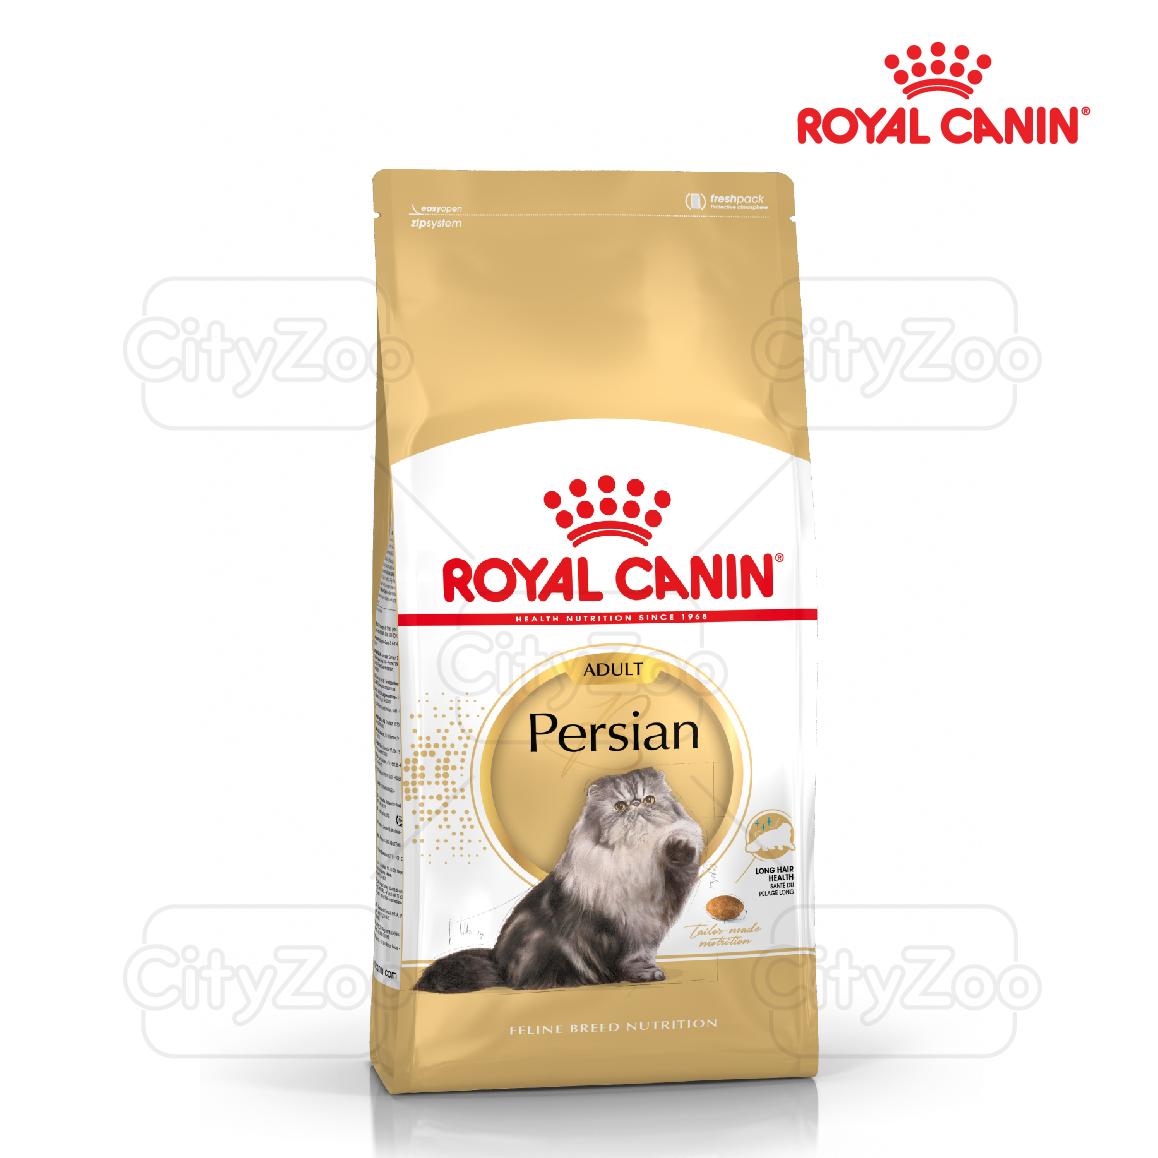 Hạt Mèo ROYAL CANIN PERSIAN ADULT 2kg